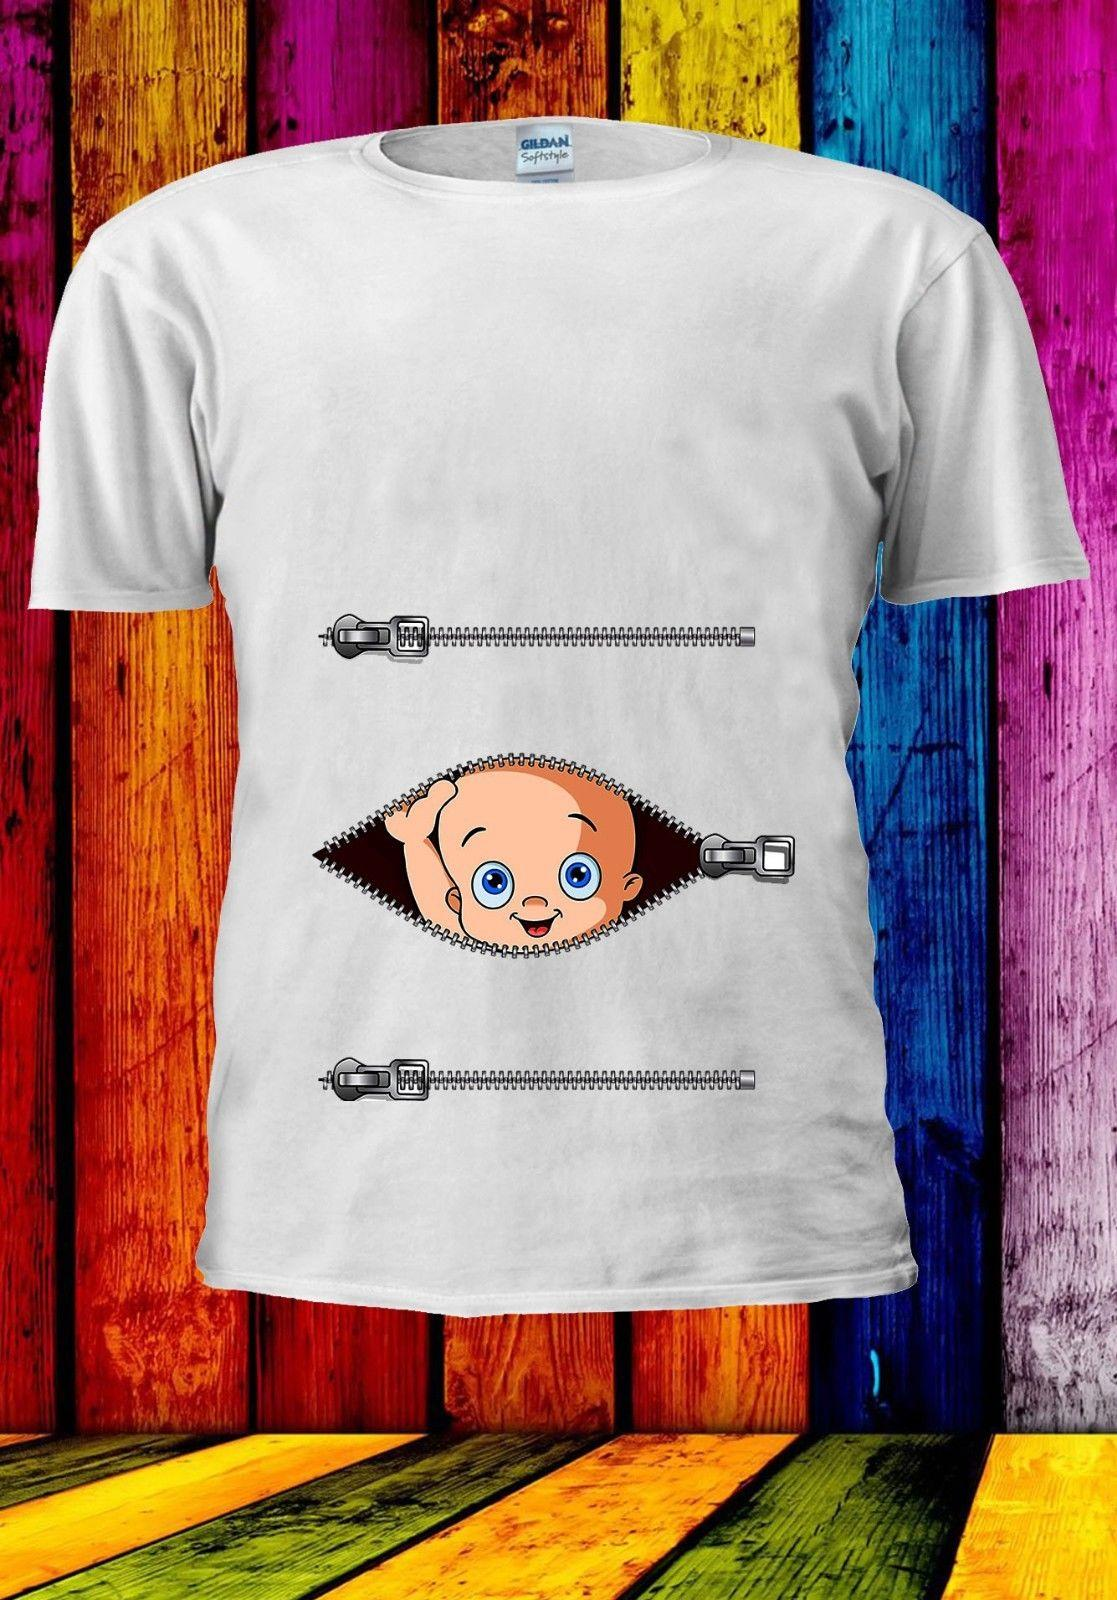 d6ac0884ce928 Peeking Baby Pregnant Maternity Fun Pregnancy Zip Men Women Unisex T Shirt  812 Cartoon T Shirt Men Unisex New Fashion Tshirt Loose Cool Tee Shirts  Designs ...